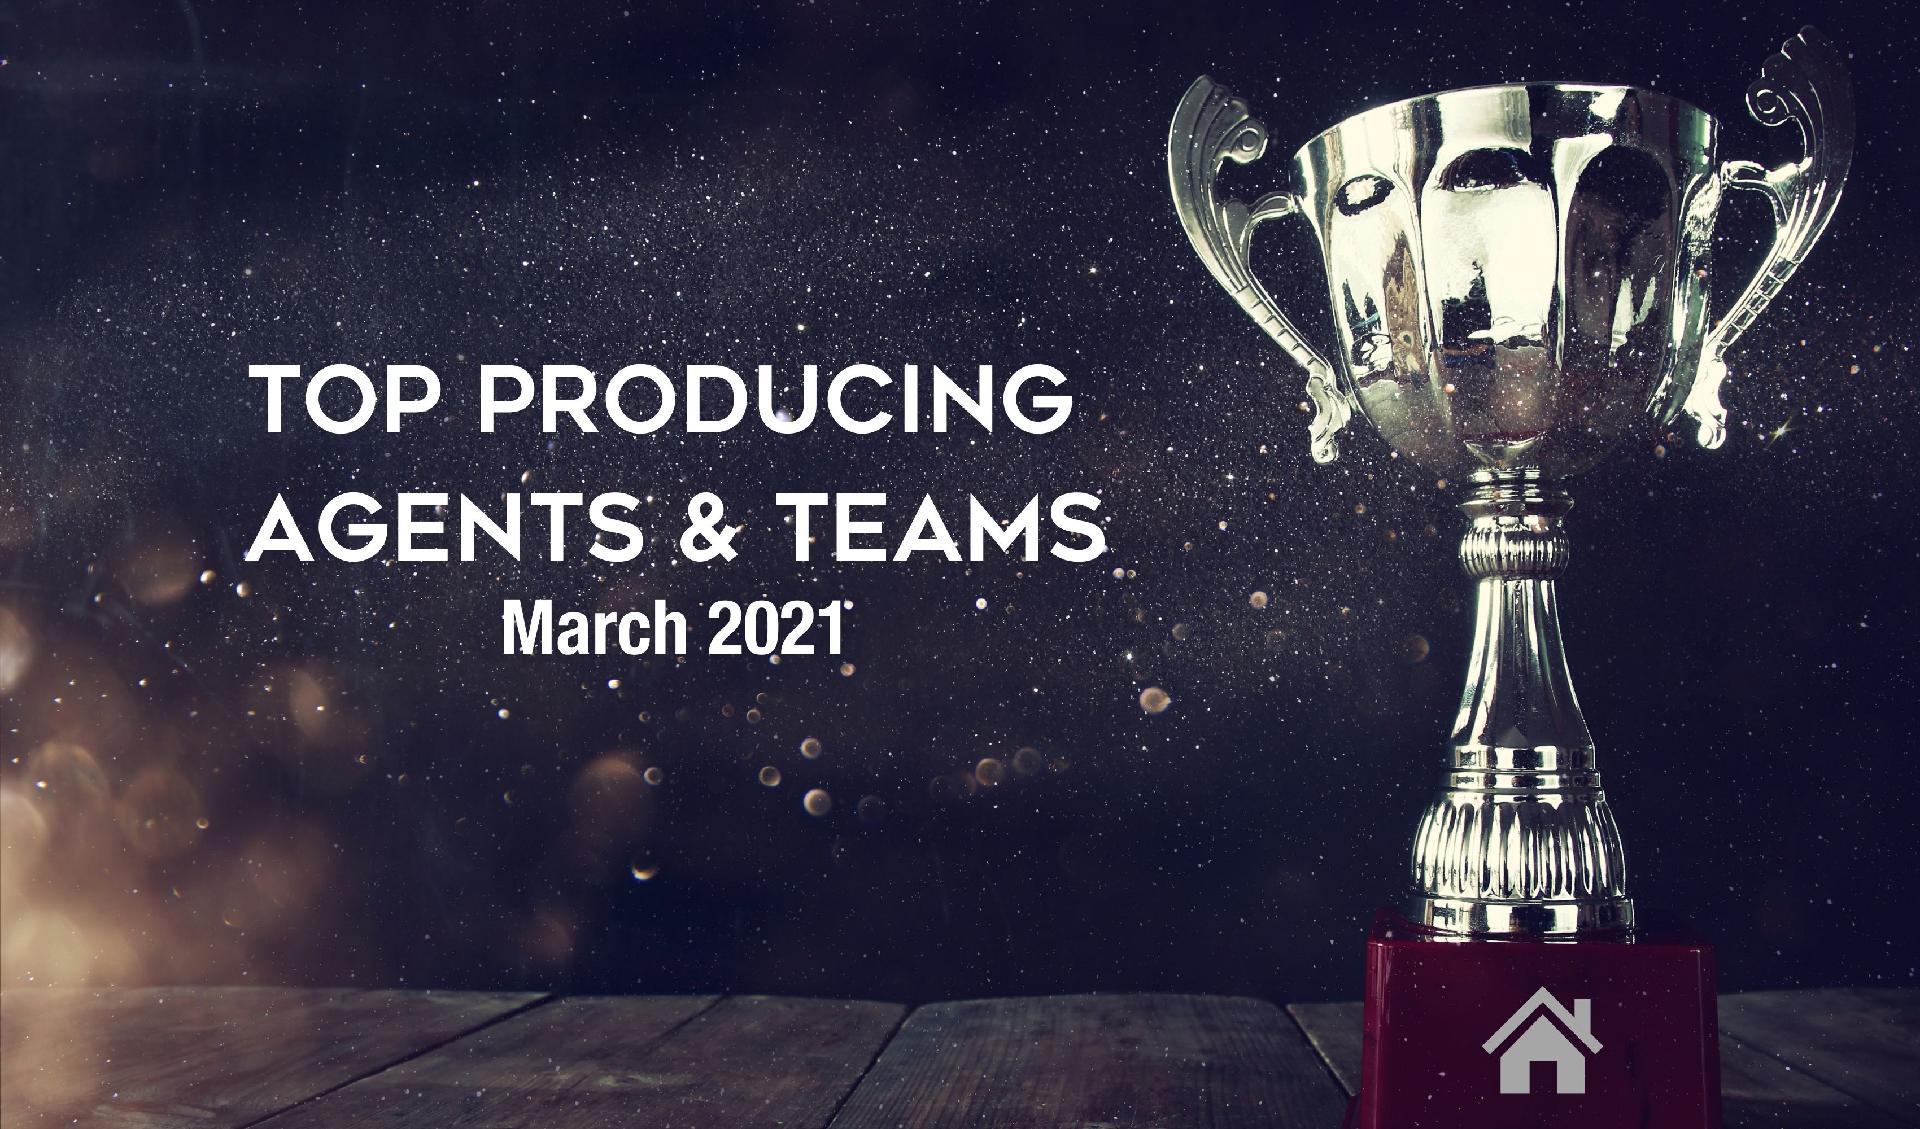 CONGRATULATIONS Top Agents & Teams! Main Photo